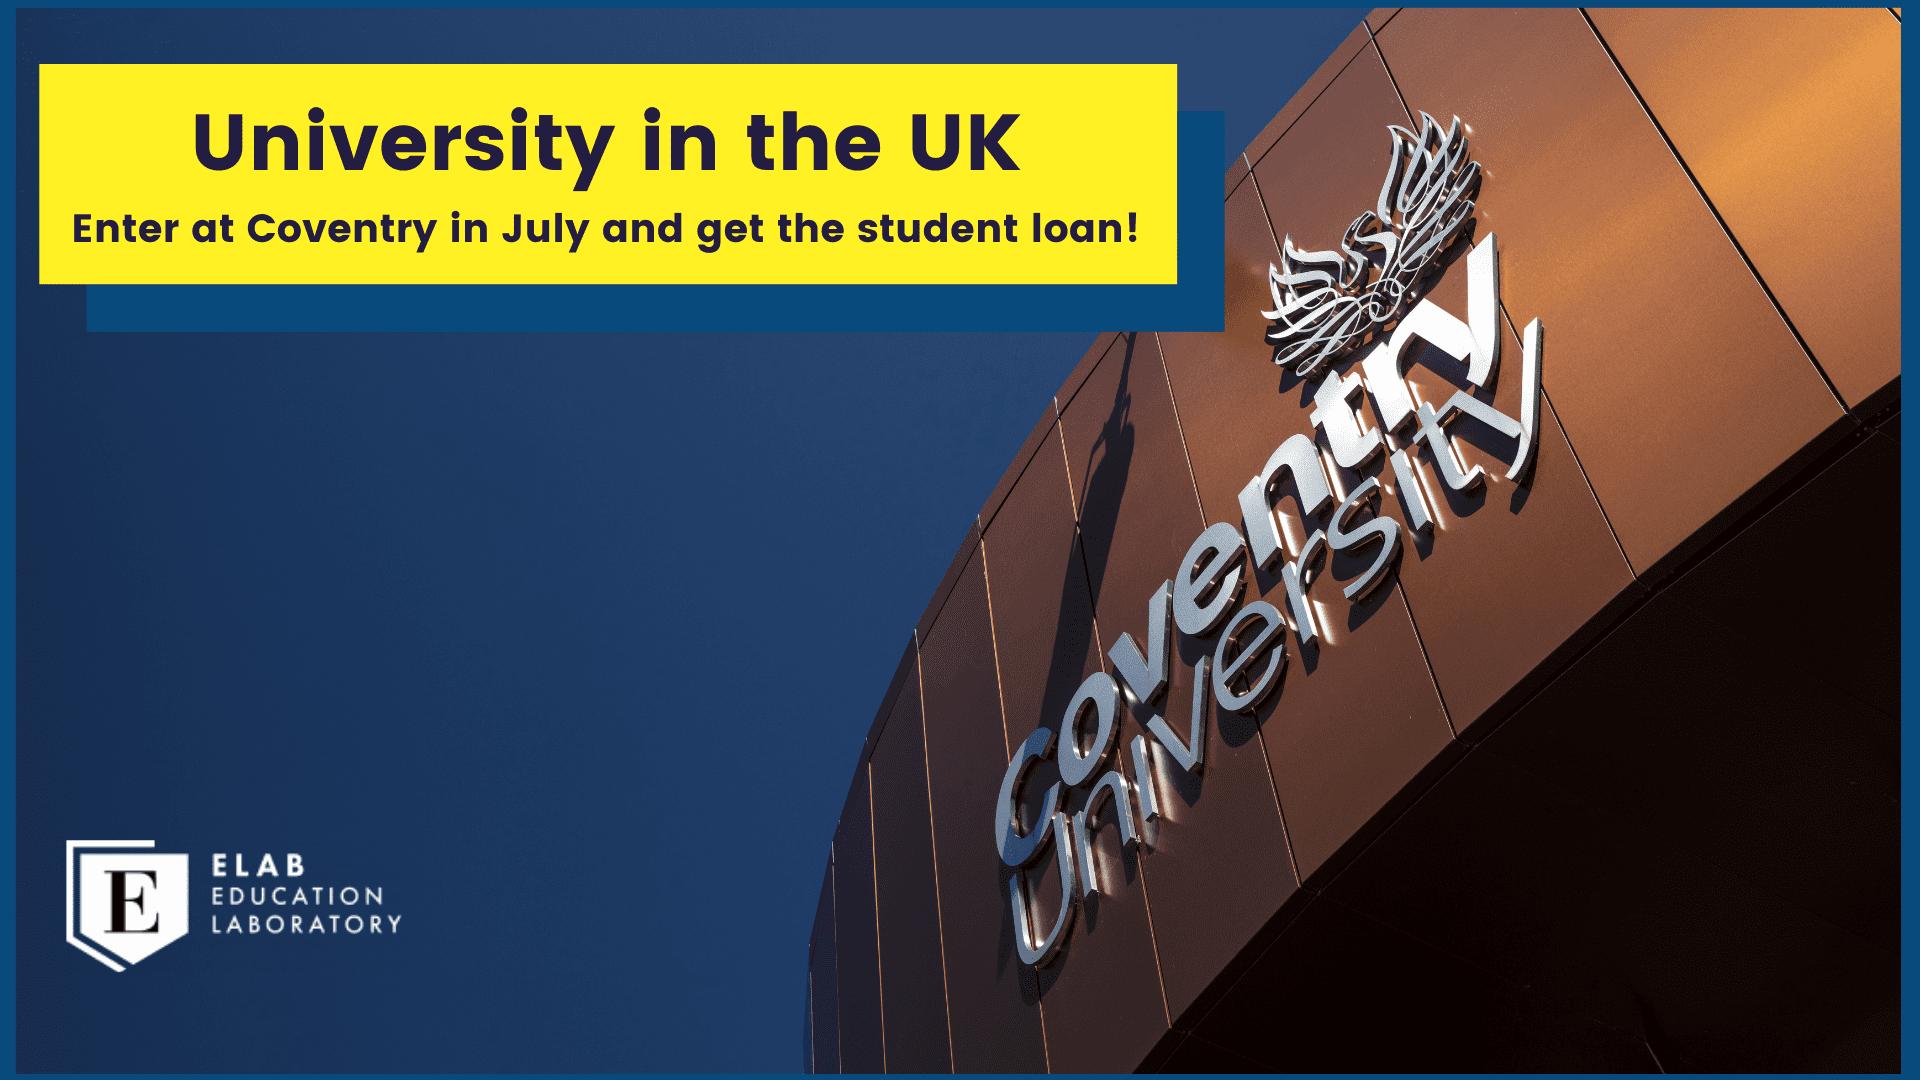 University in the UK elab